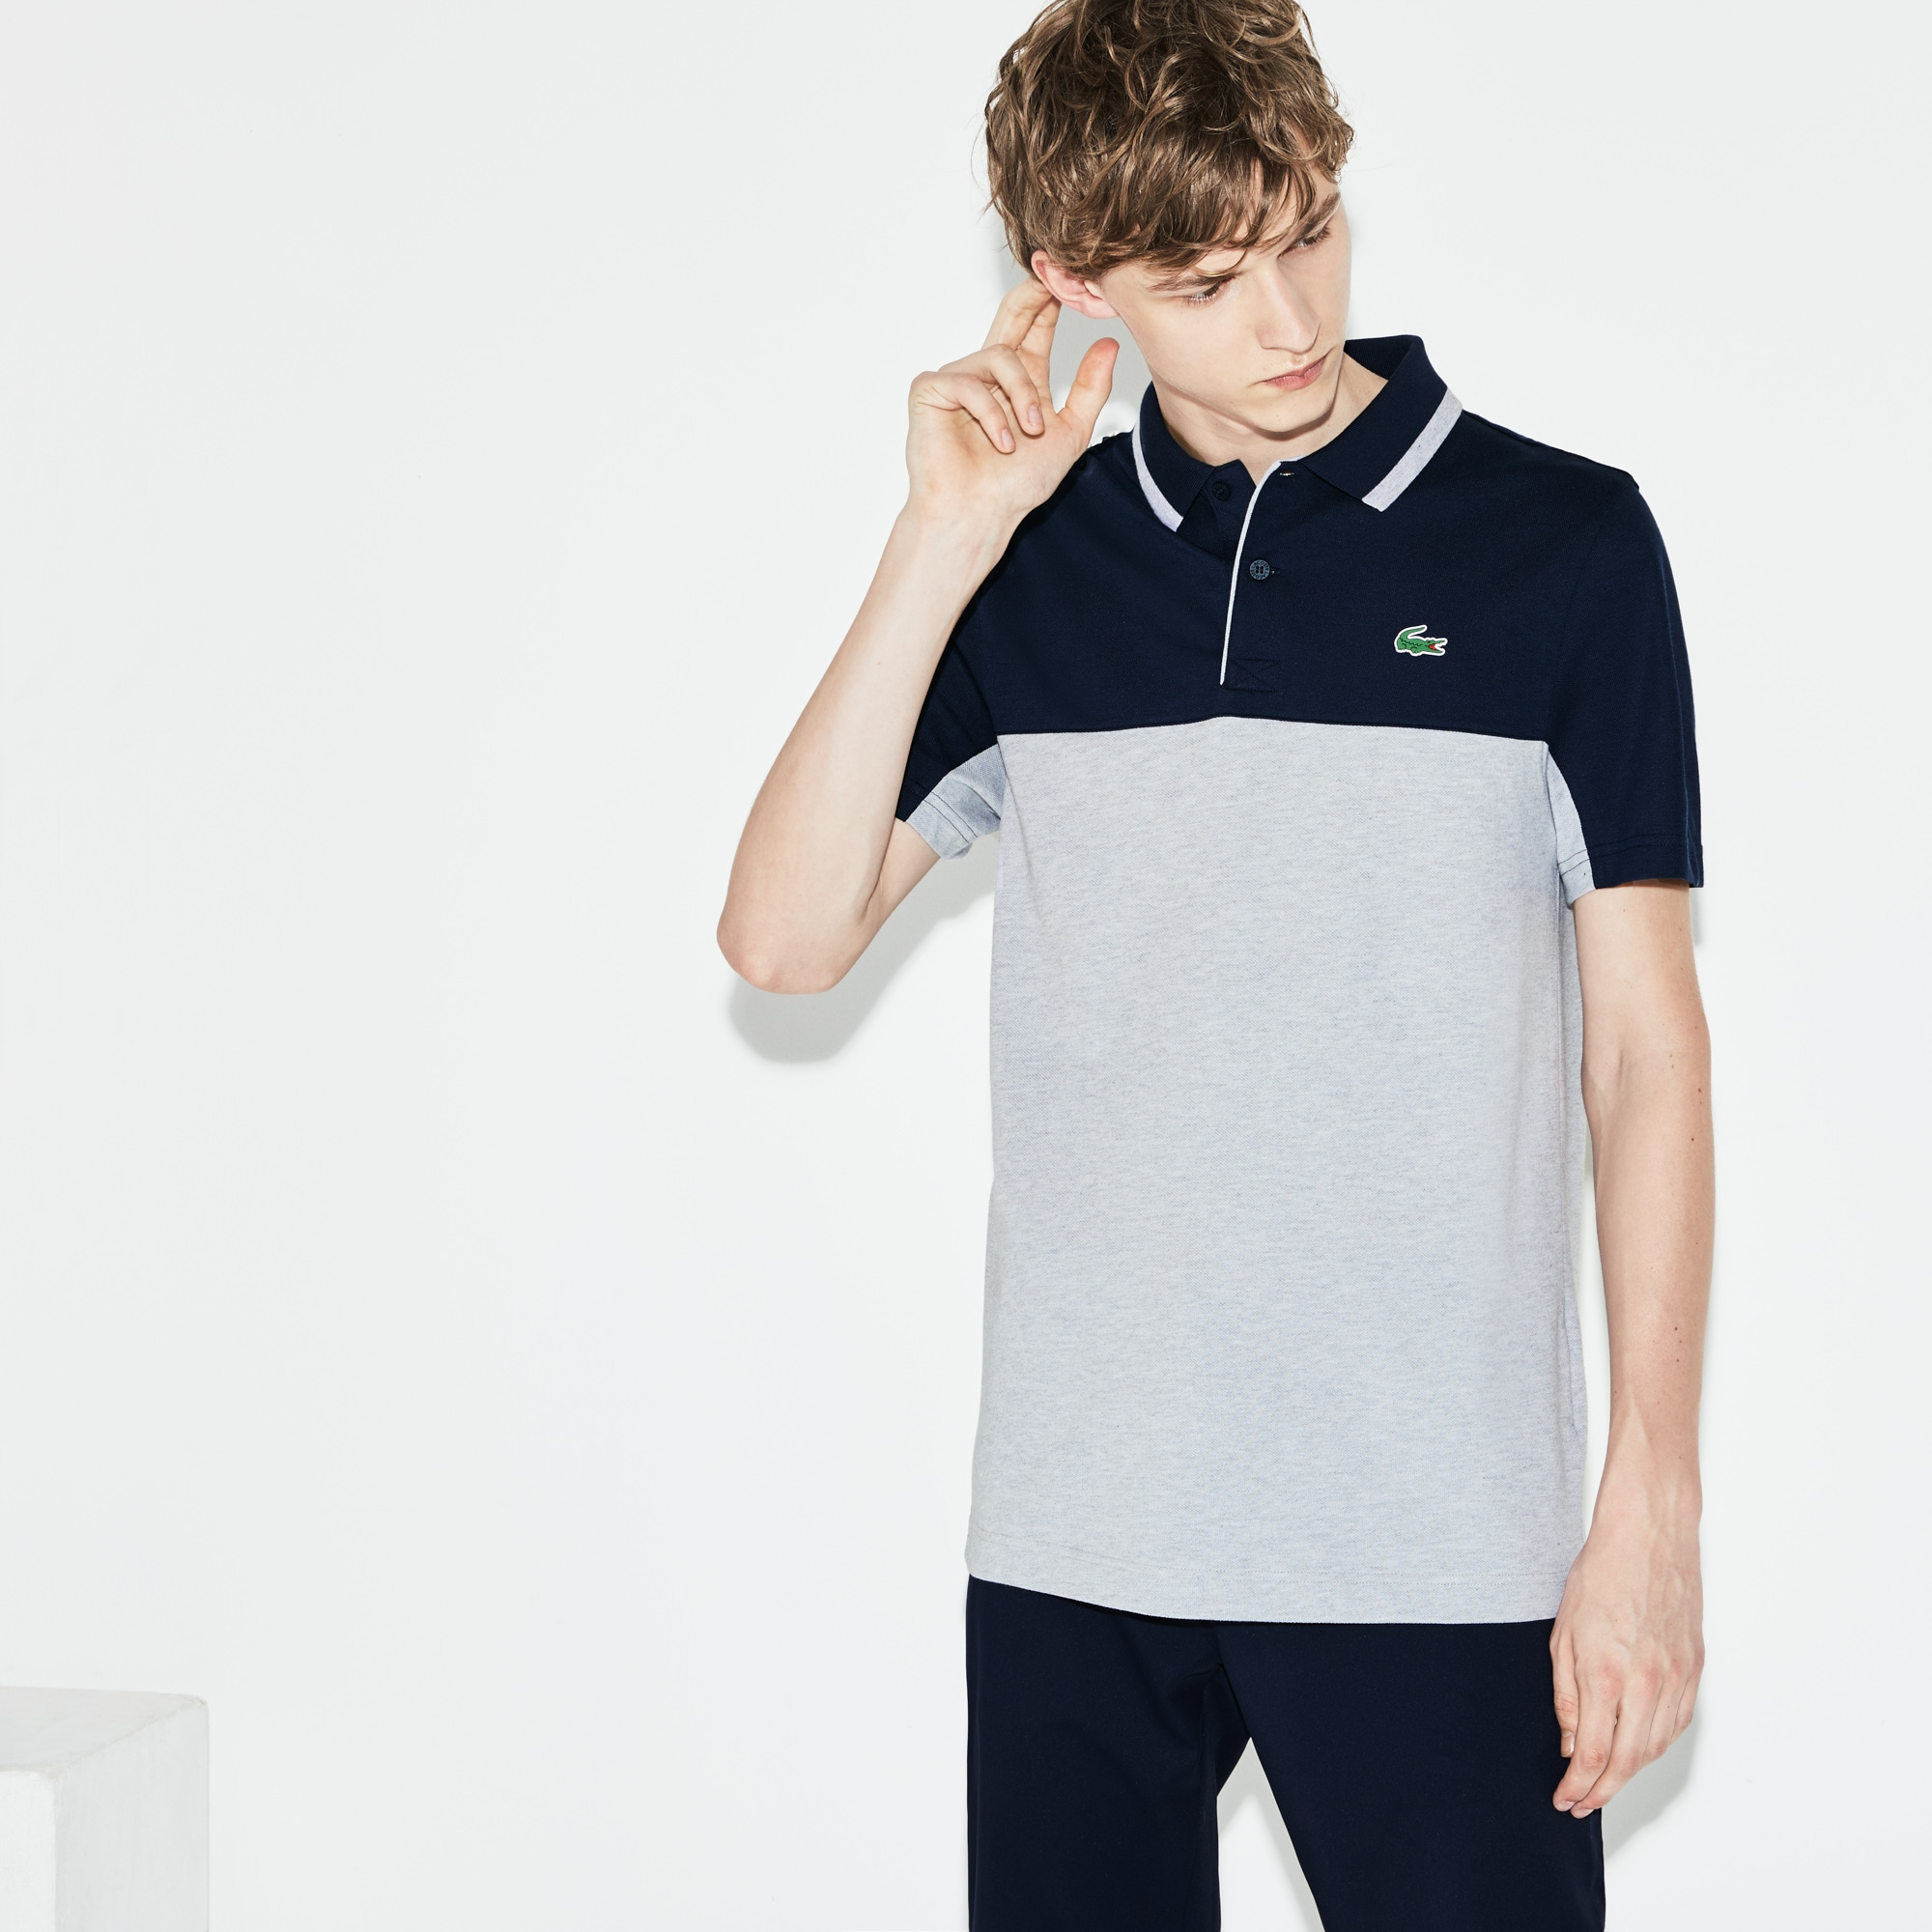 Lacoste - Herren LACOSTE SPORT Ryder Cup Edition Golf Poloshirt - 1